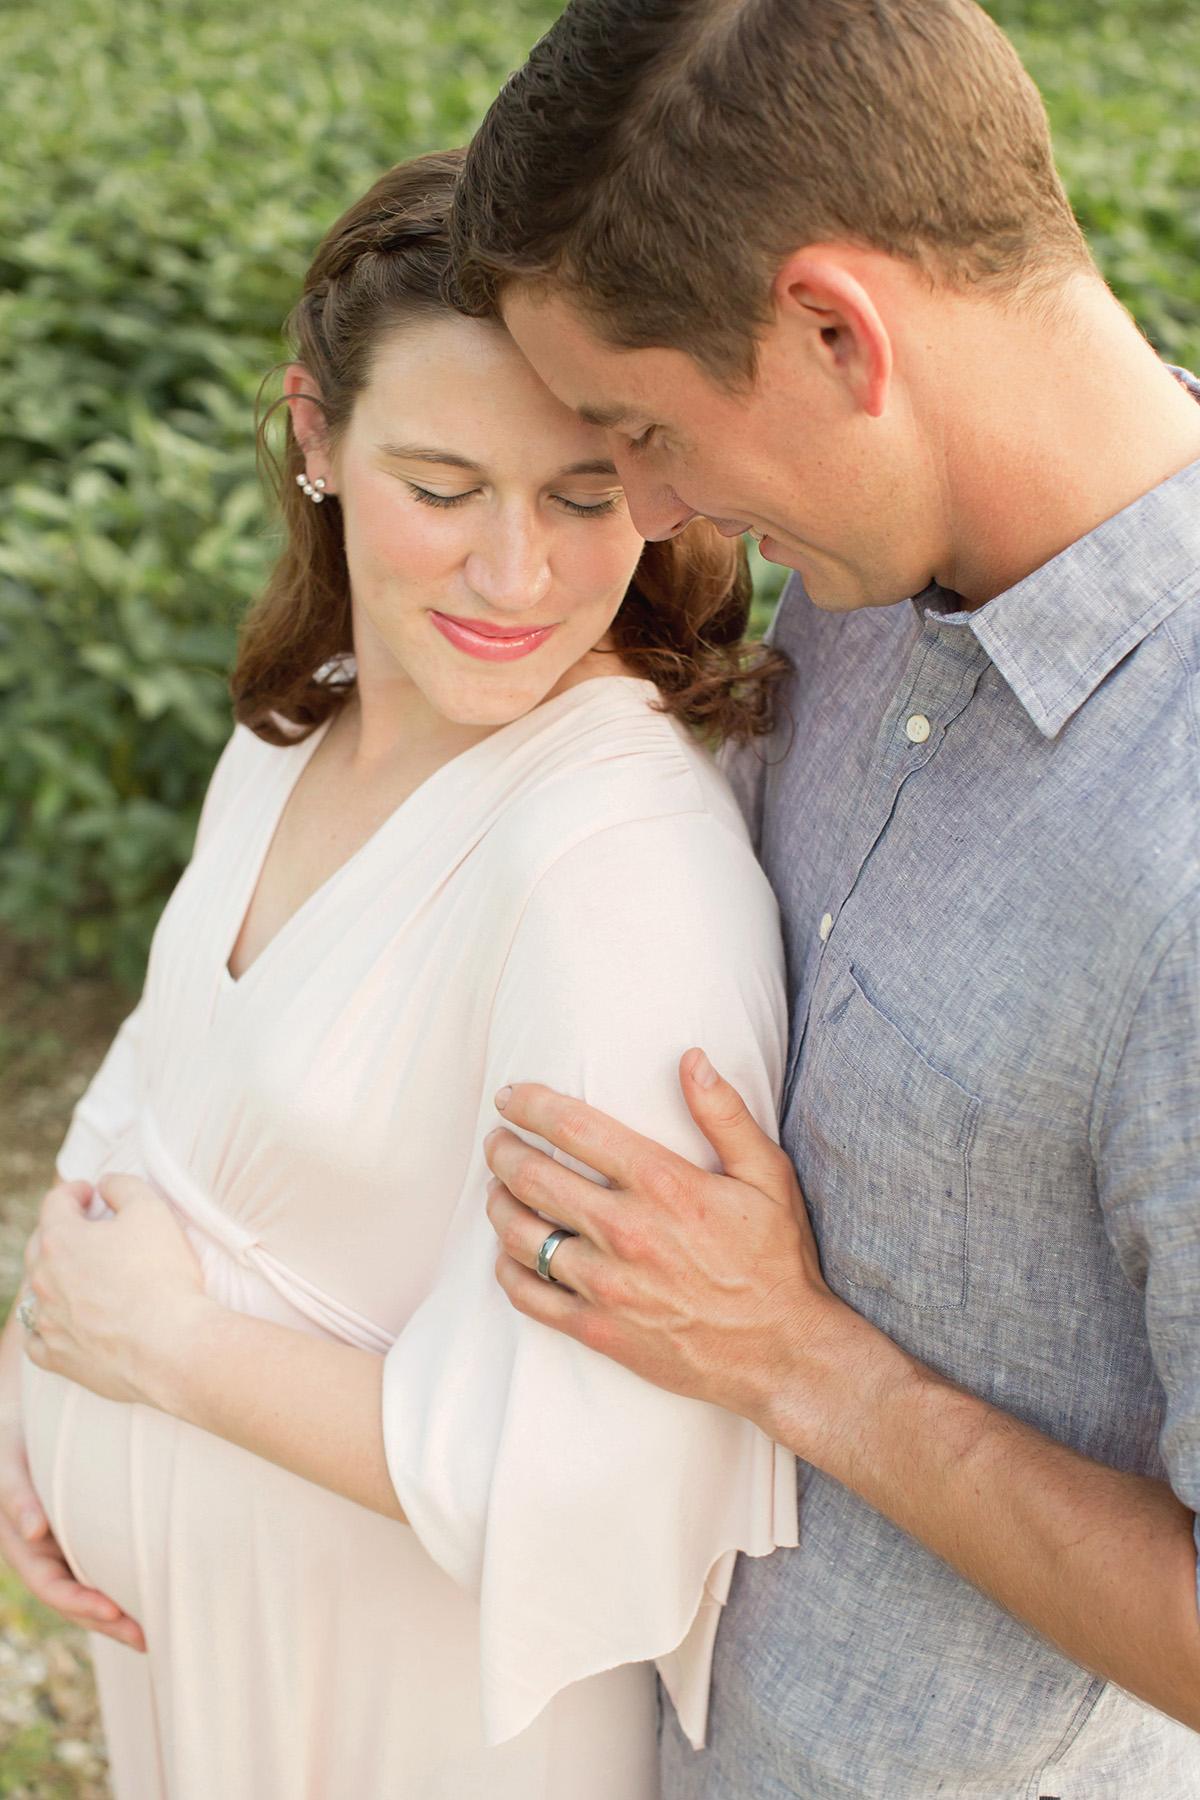 Louisville Newborn Photographer | Julie Brock Photographer | Louisville Maternity Photographers | Louisville Family Photographer.jpg